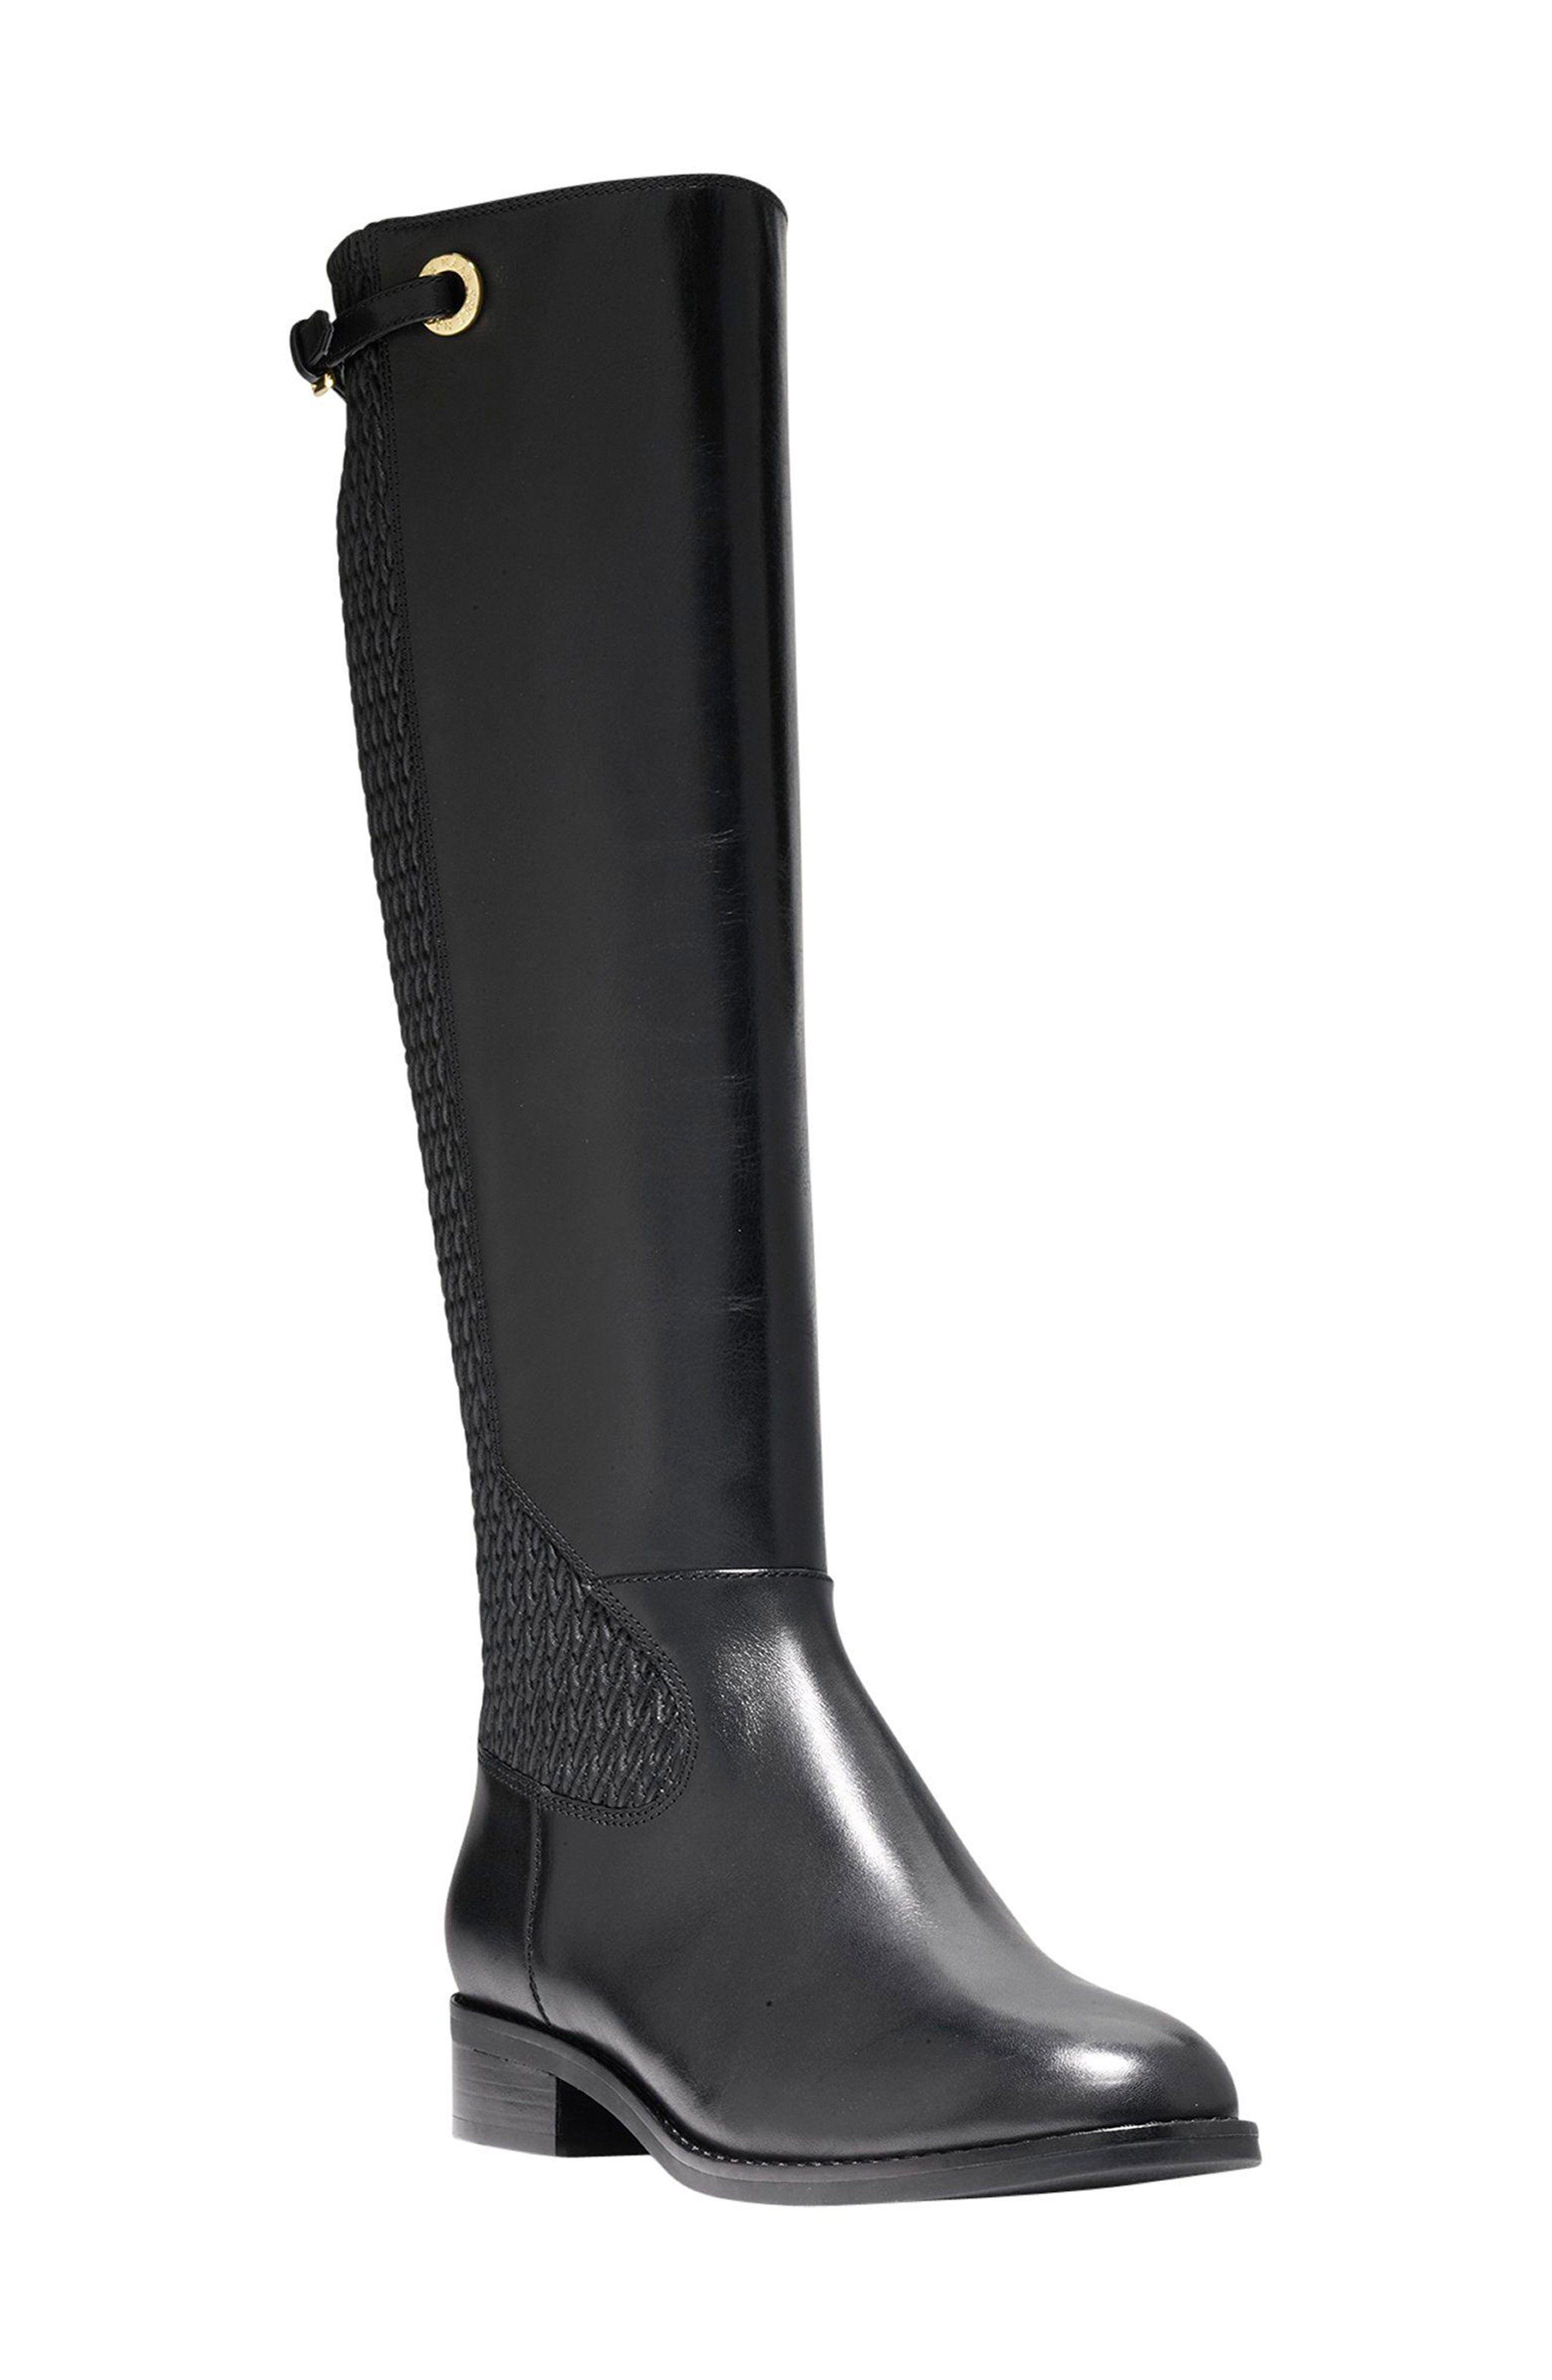 orthopedic tall boots